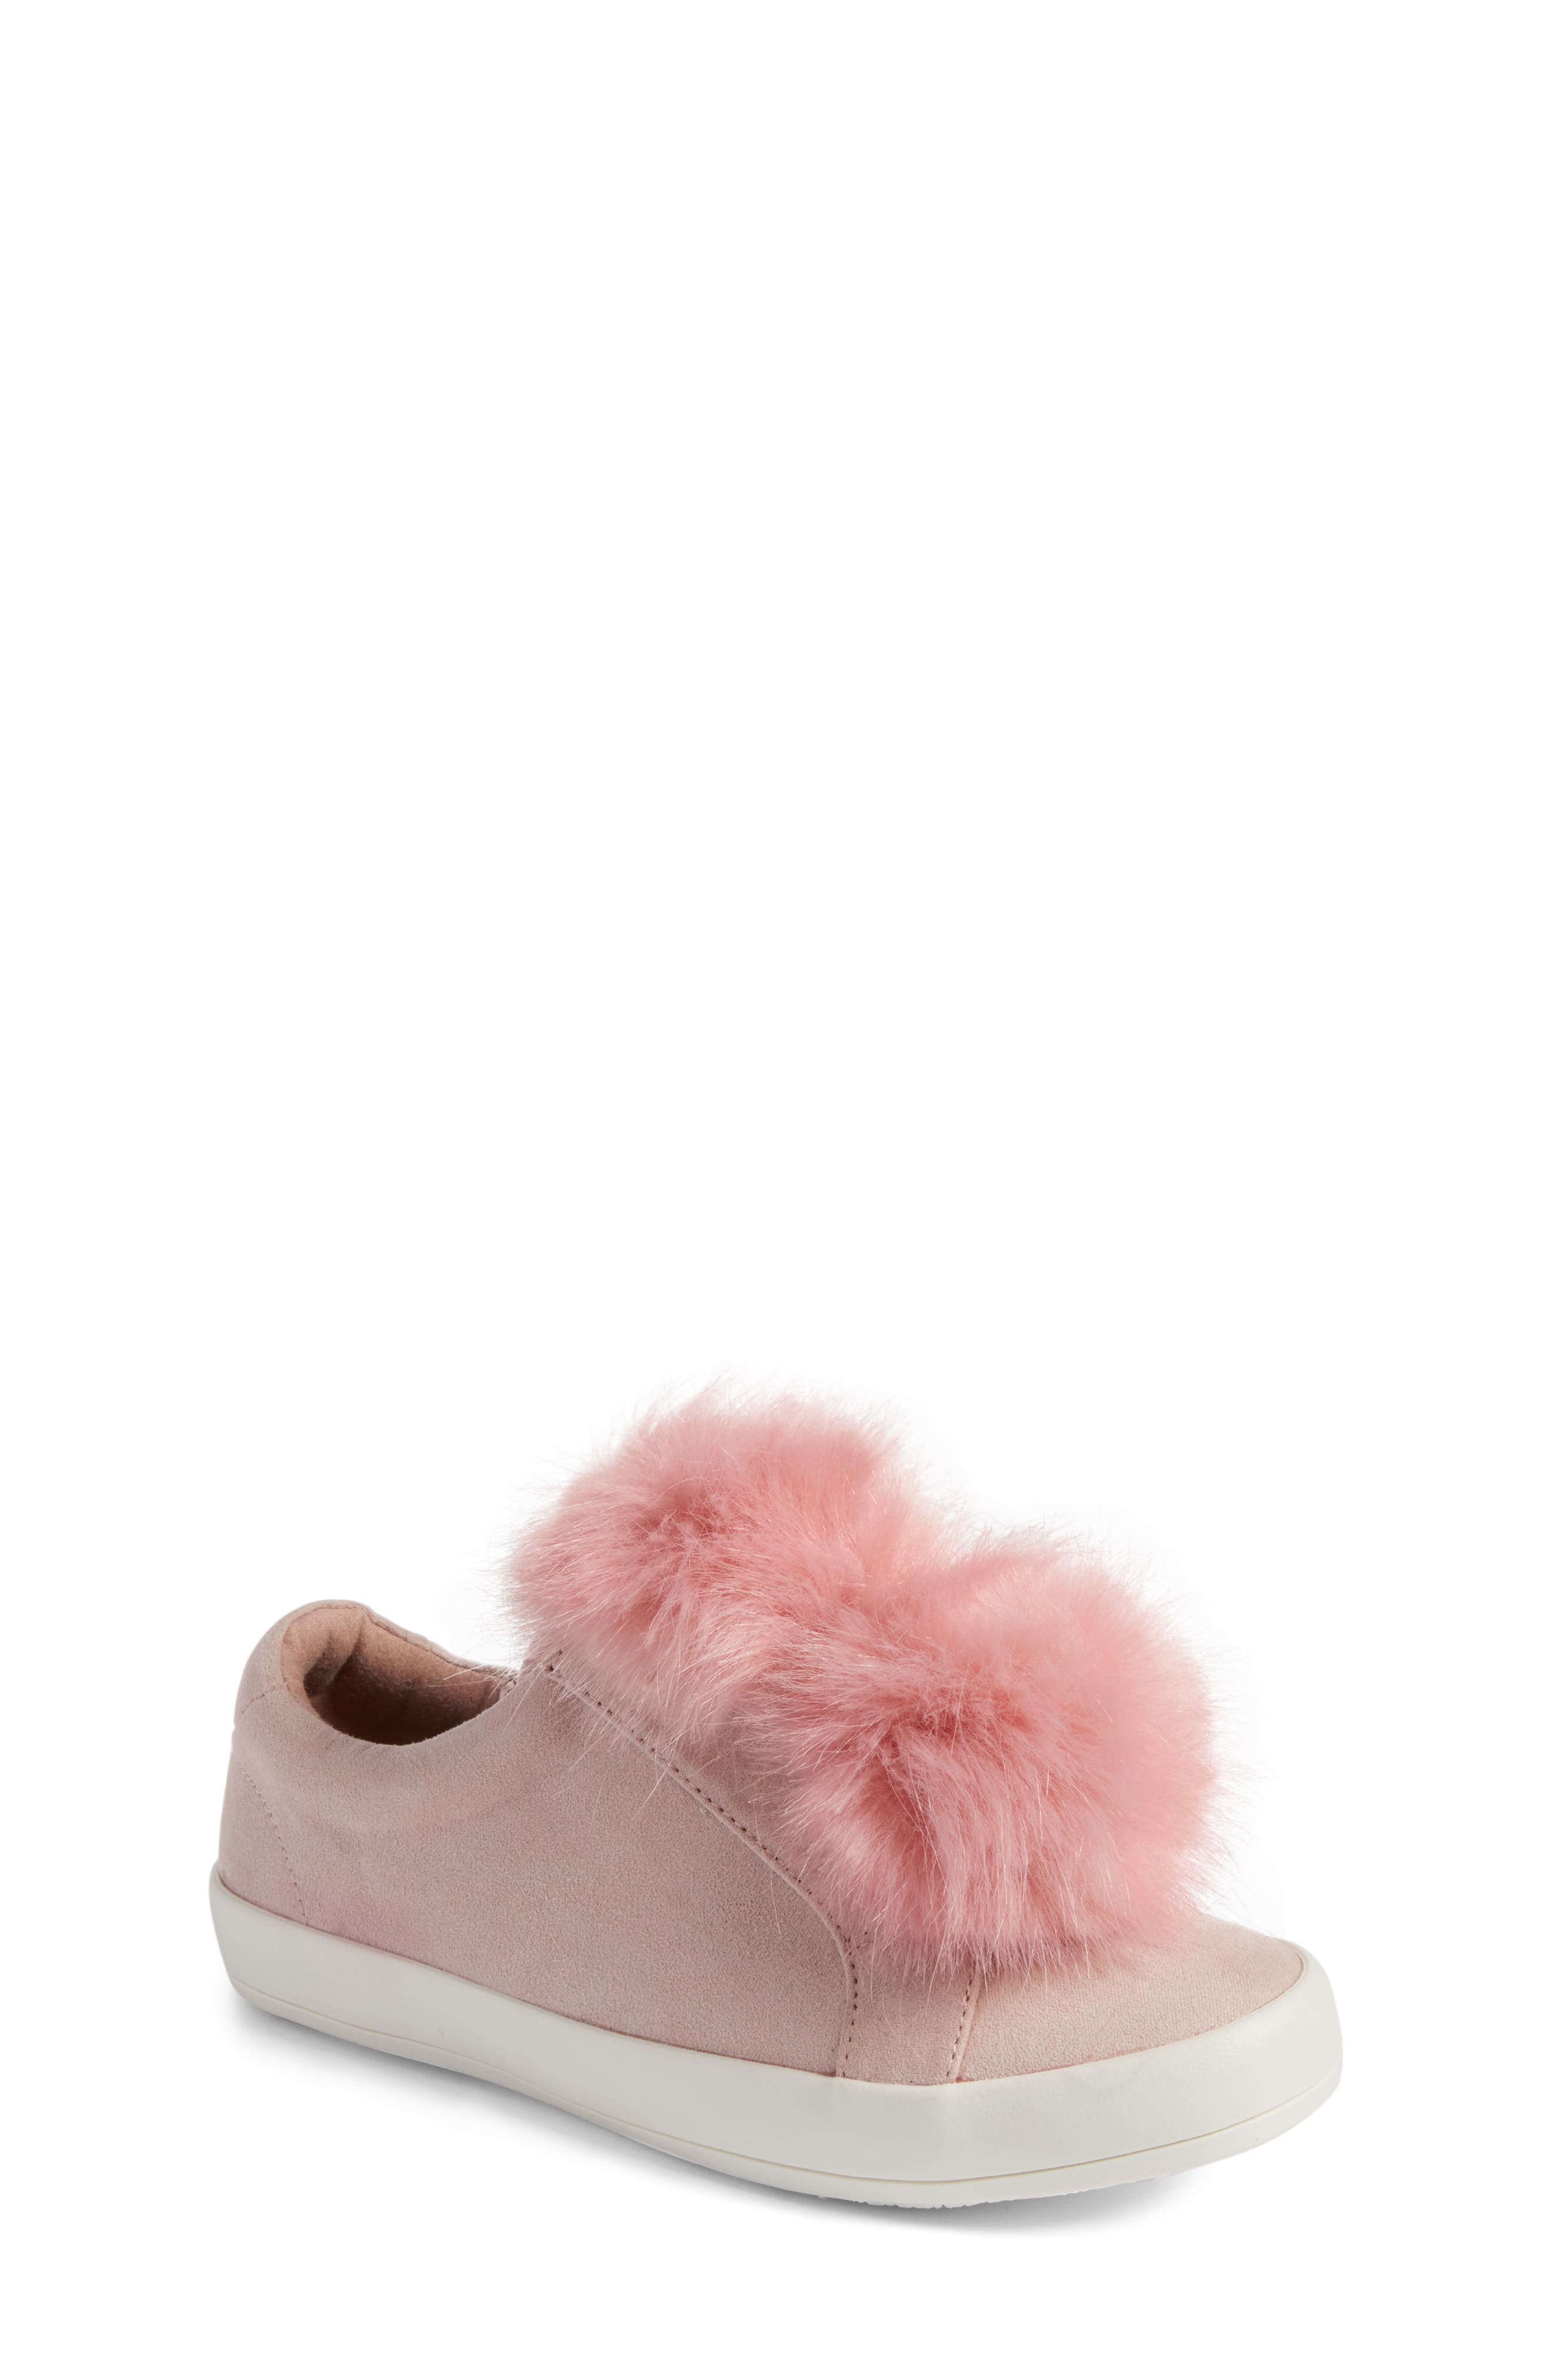 Sam Edelman Cynthia Leya Faux Fur Pompom Slip-On Sneaker (Toddler, Little Kid & Big Kid)